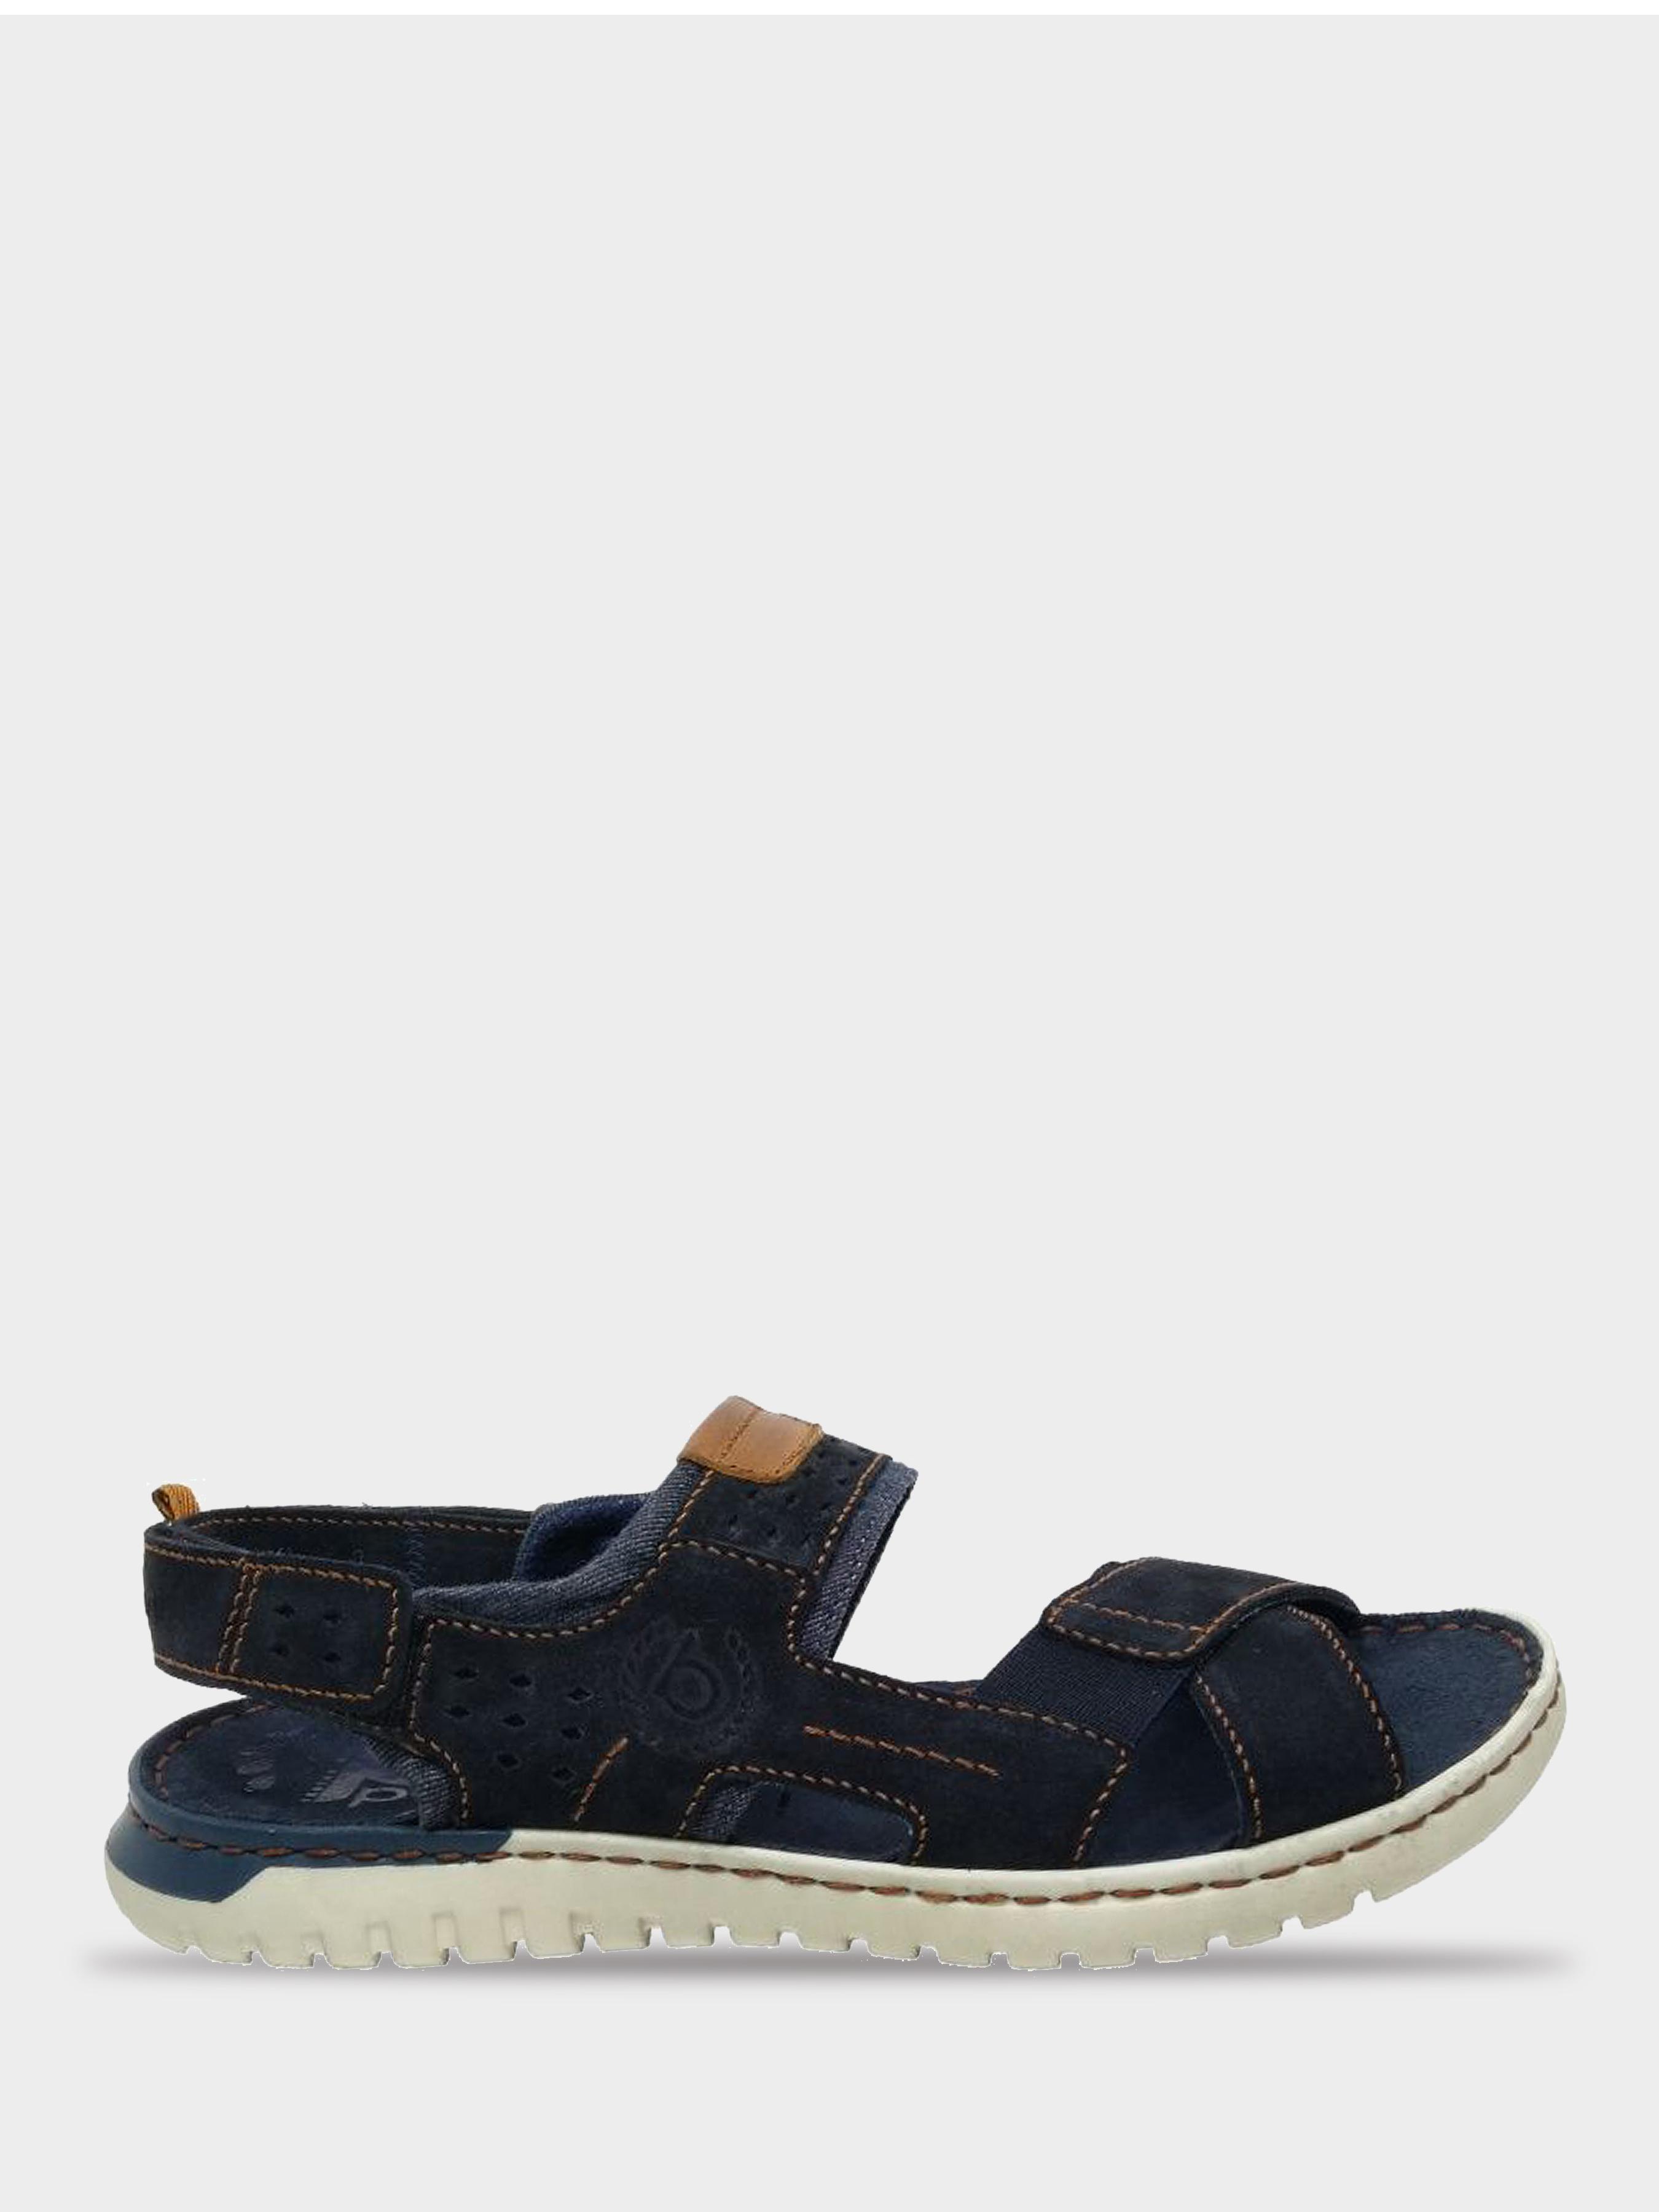 Сандалии для мужчин Bugatti YD179 размерная сетка обуви, 2017